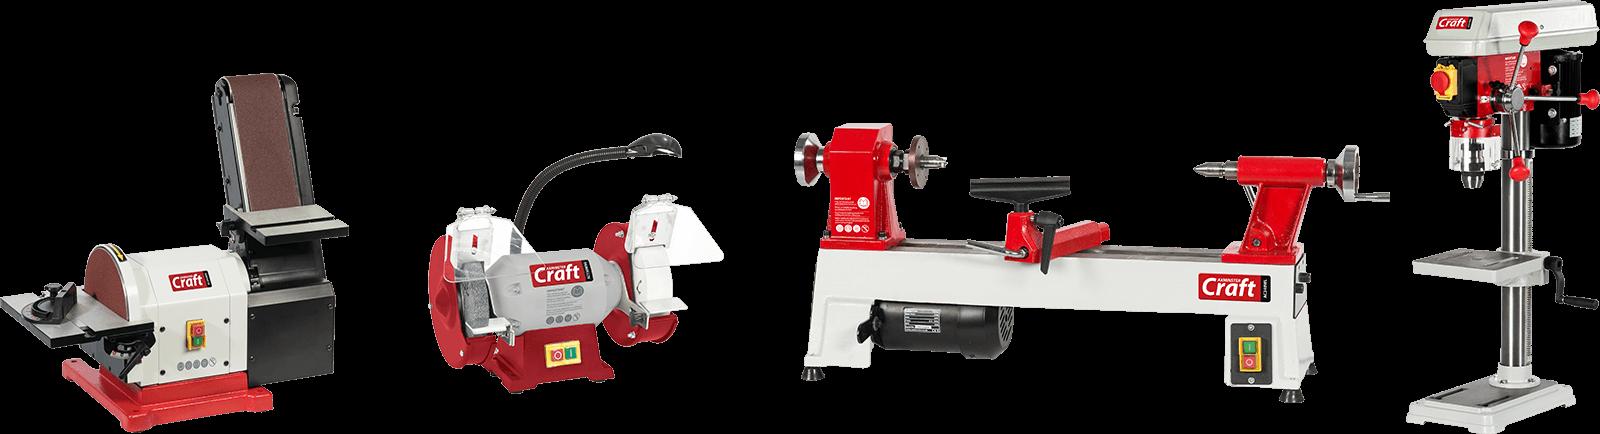 Axminster Craft machines